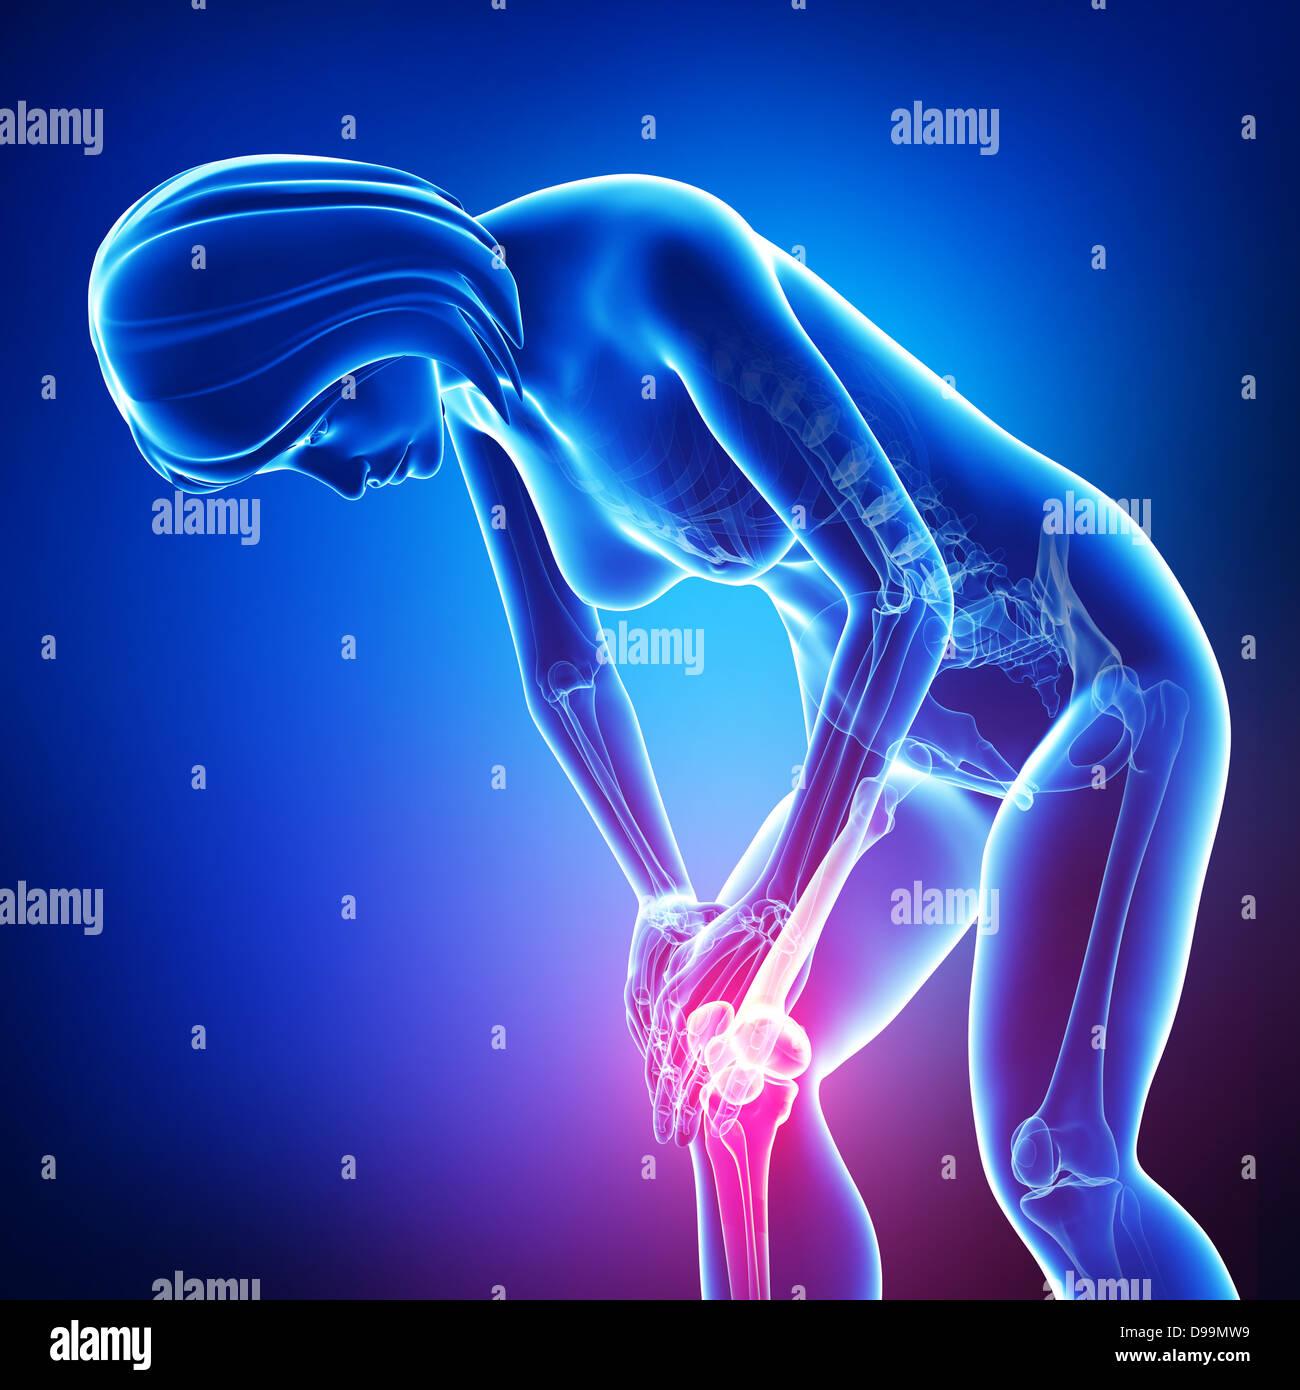 Human knee pain anatomy Stock Photo: 57376965 - Alamy